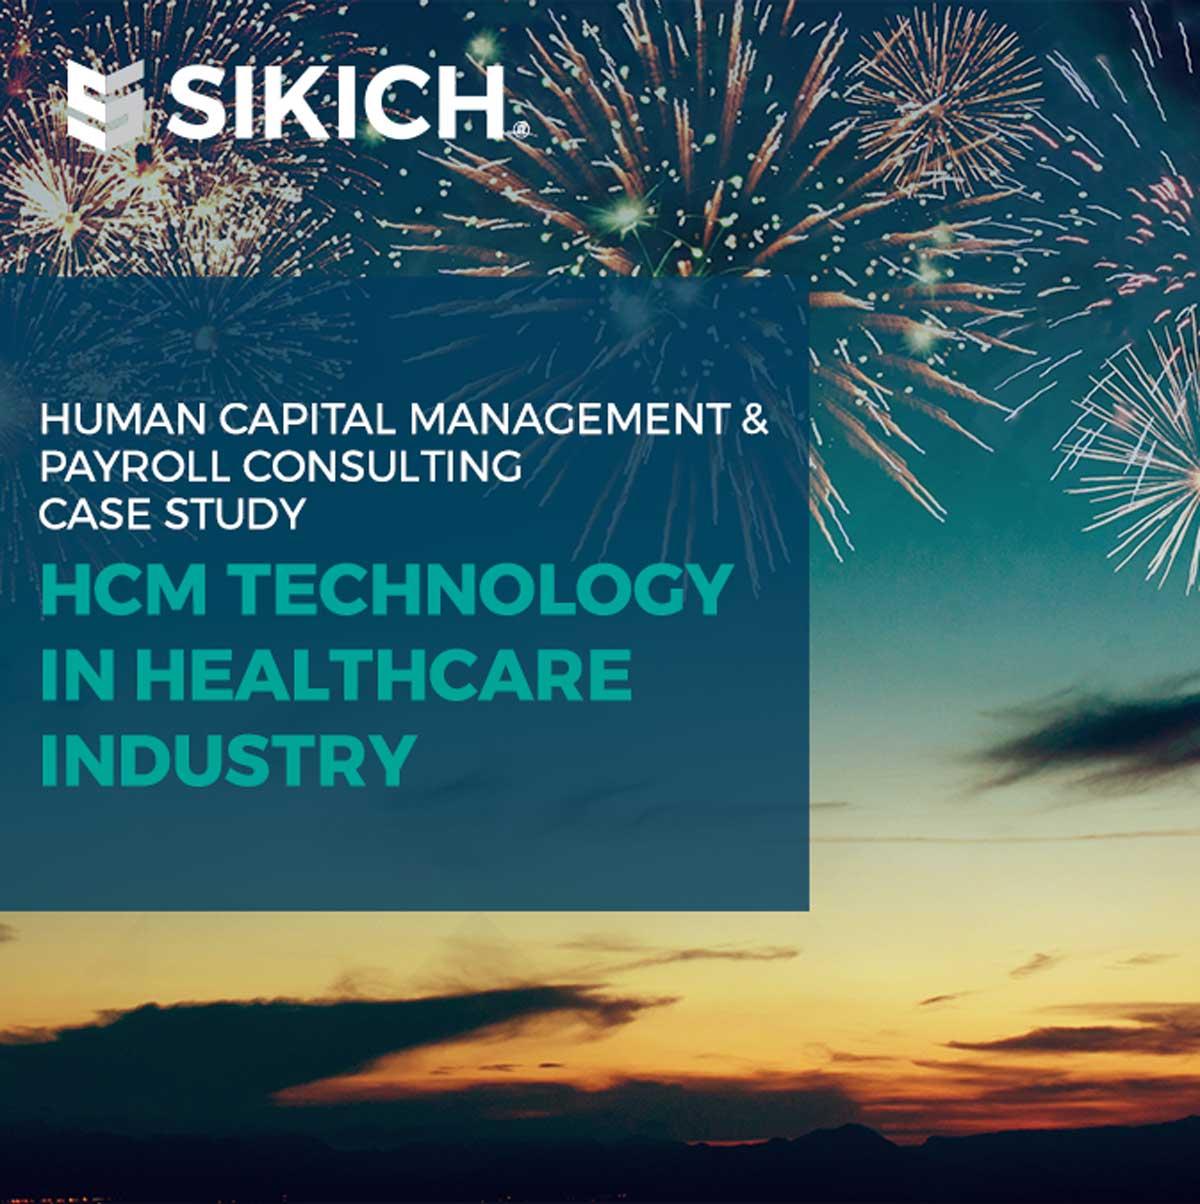 HCM-Healthcare-Provider-Case-Study